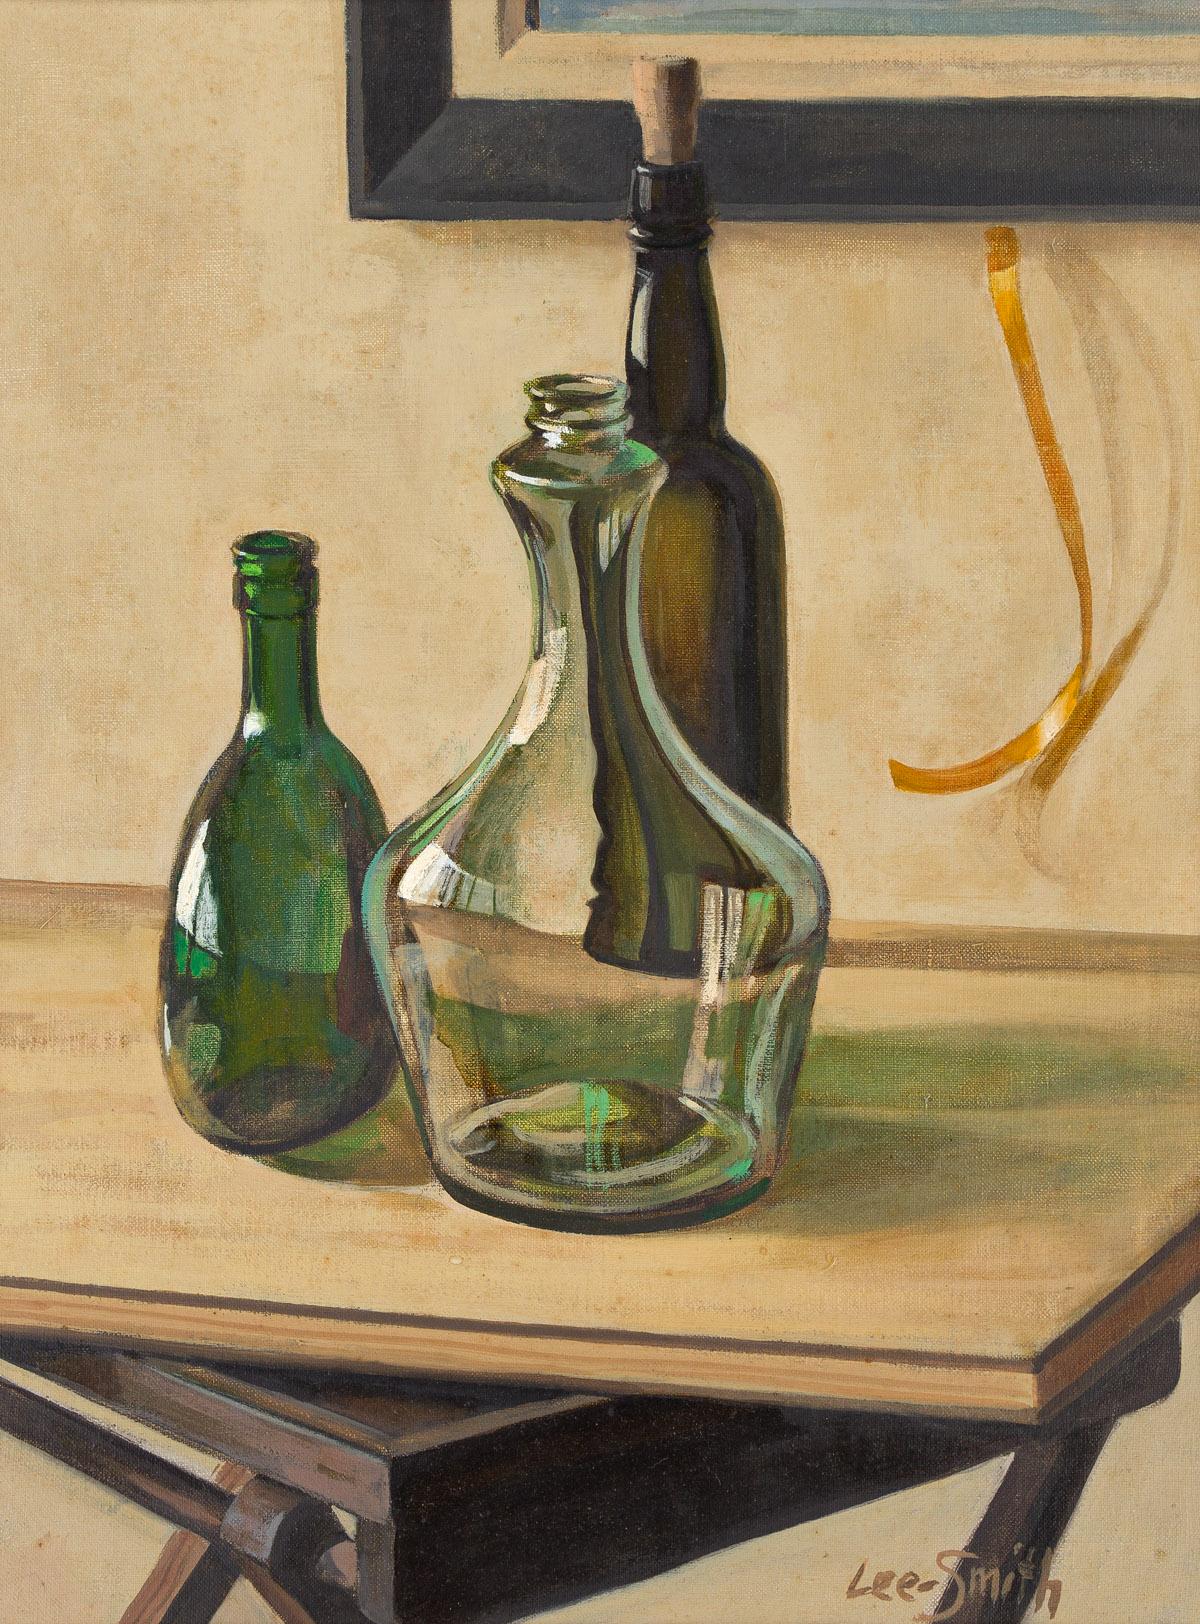 HUGHIE LEE-SMITH (1915 - 1999) Untitled (Still Life with Three Wine Bottles).